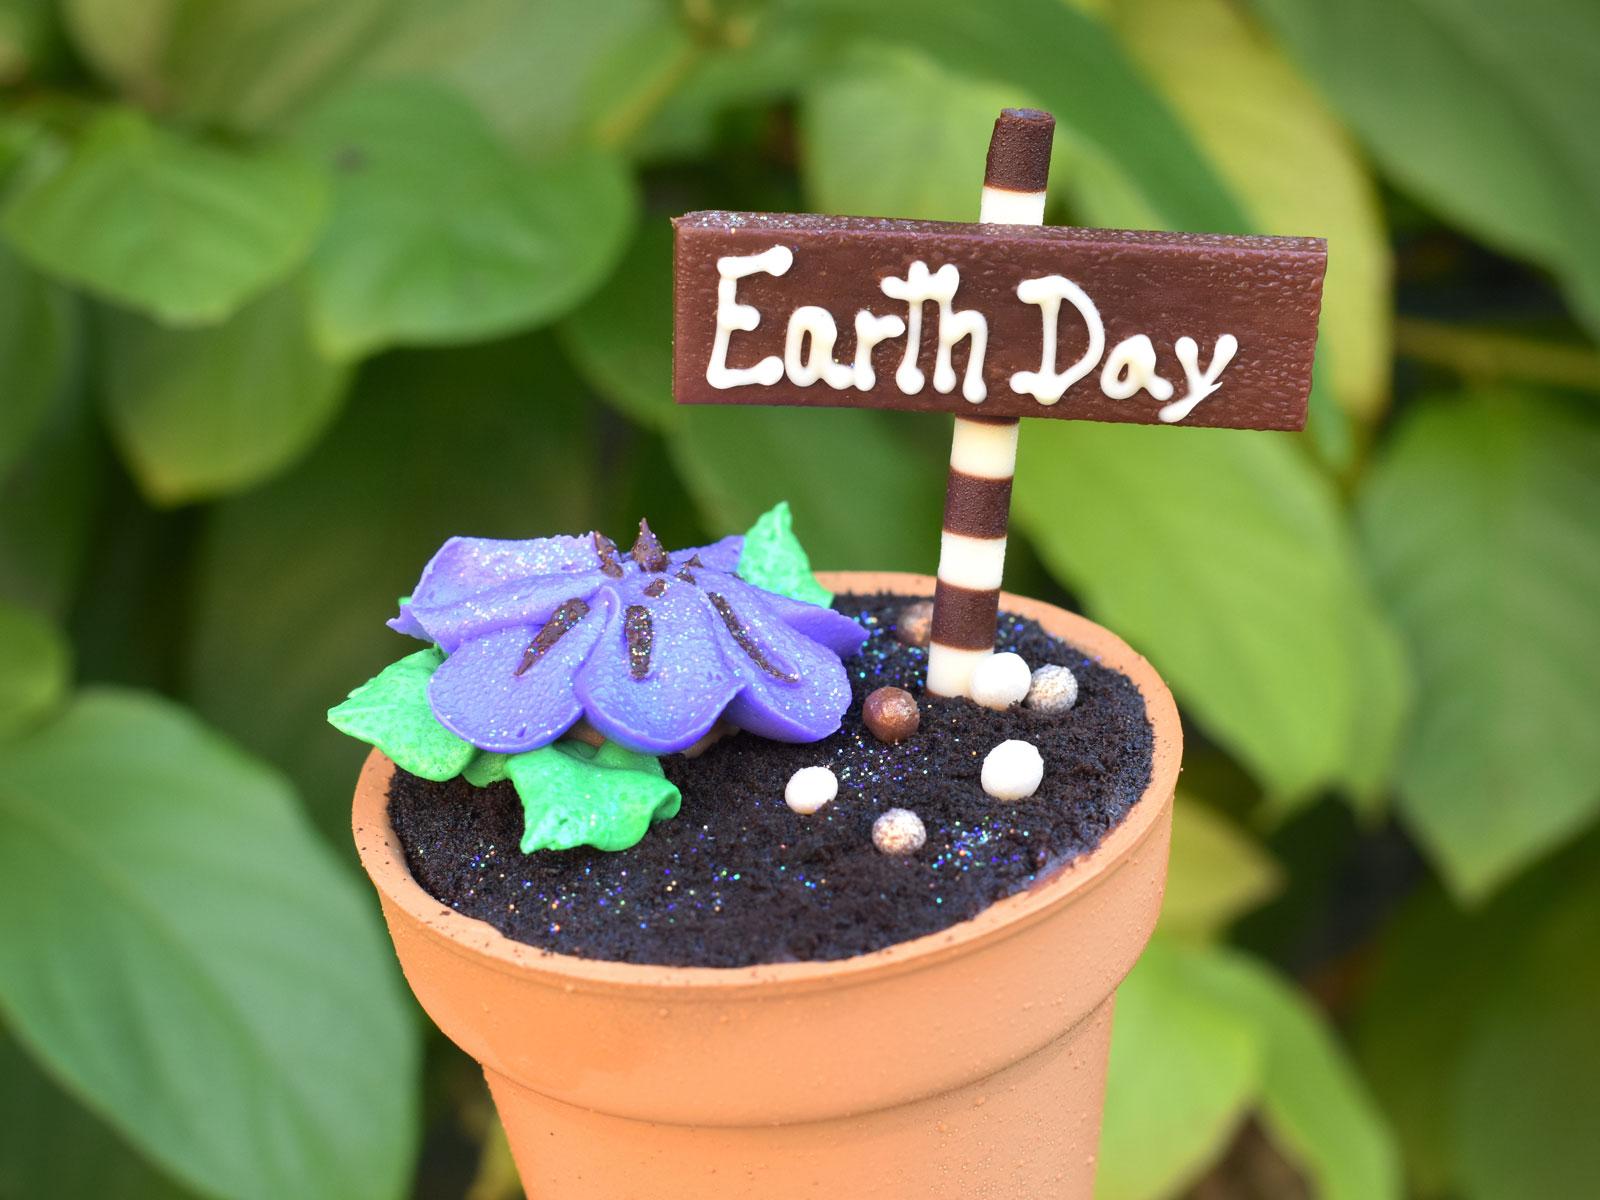 Disney World Debuts 5 Garden-Themed Cupcakes for Earth Day